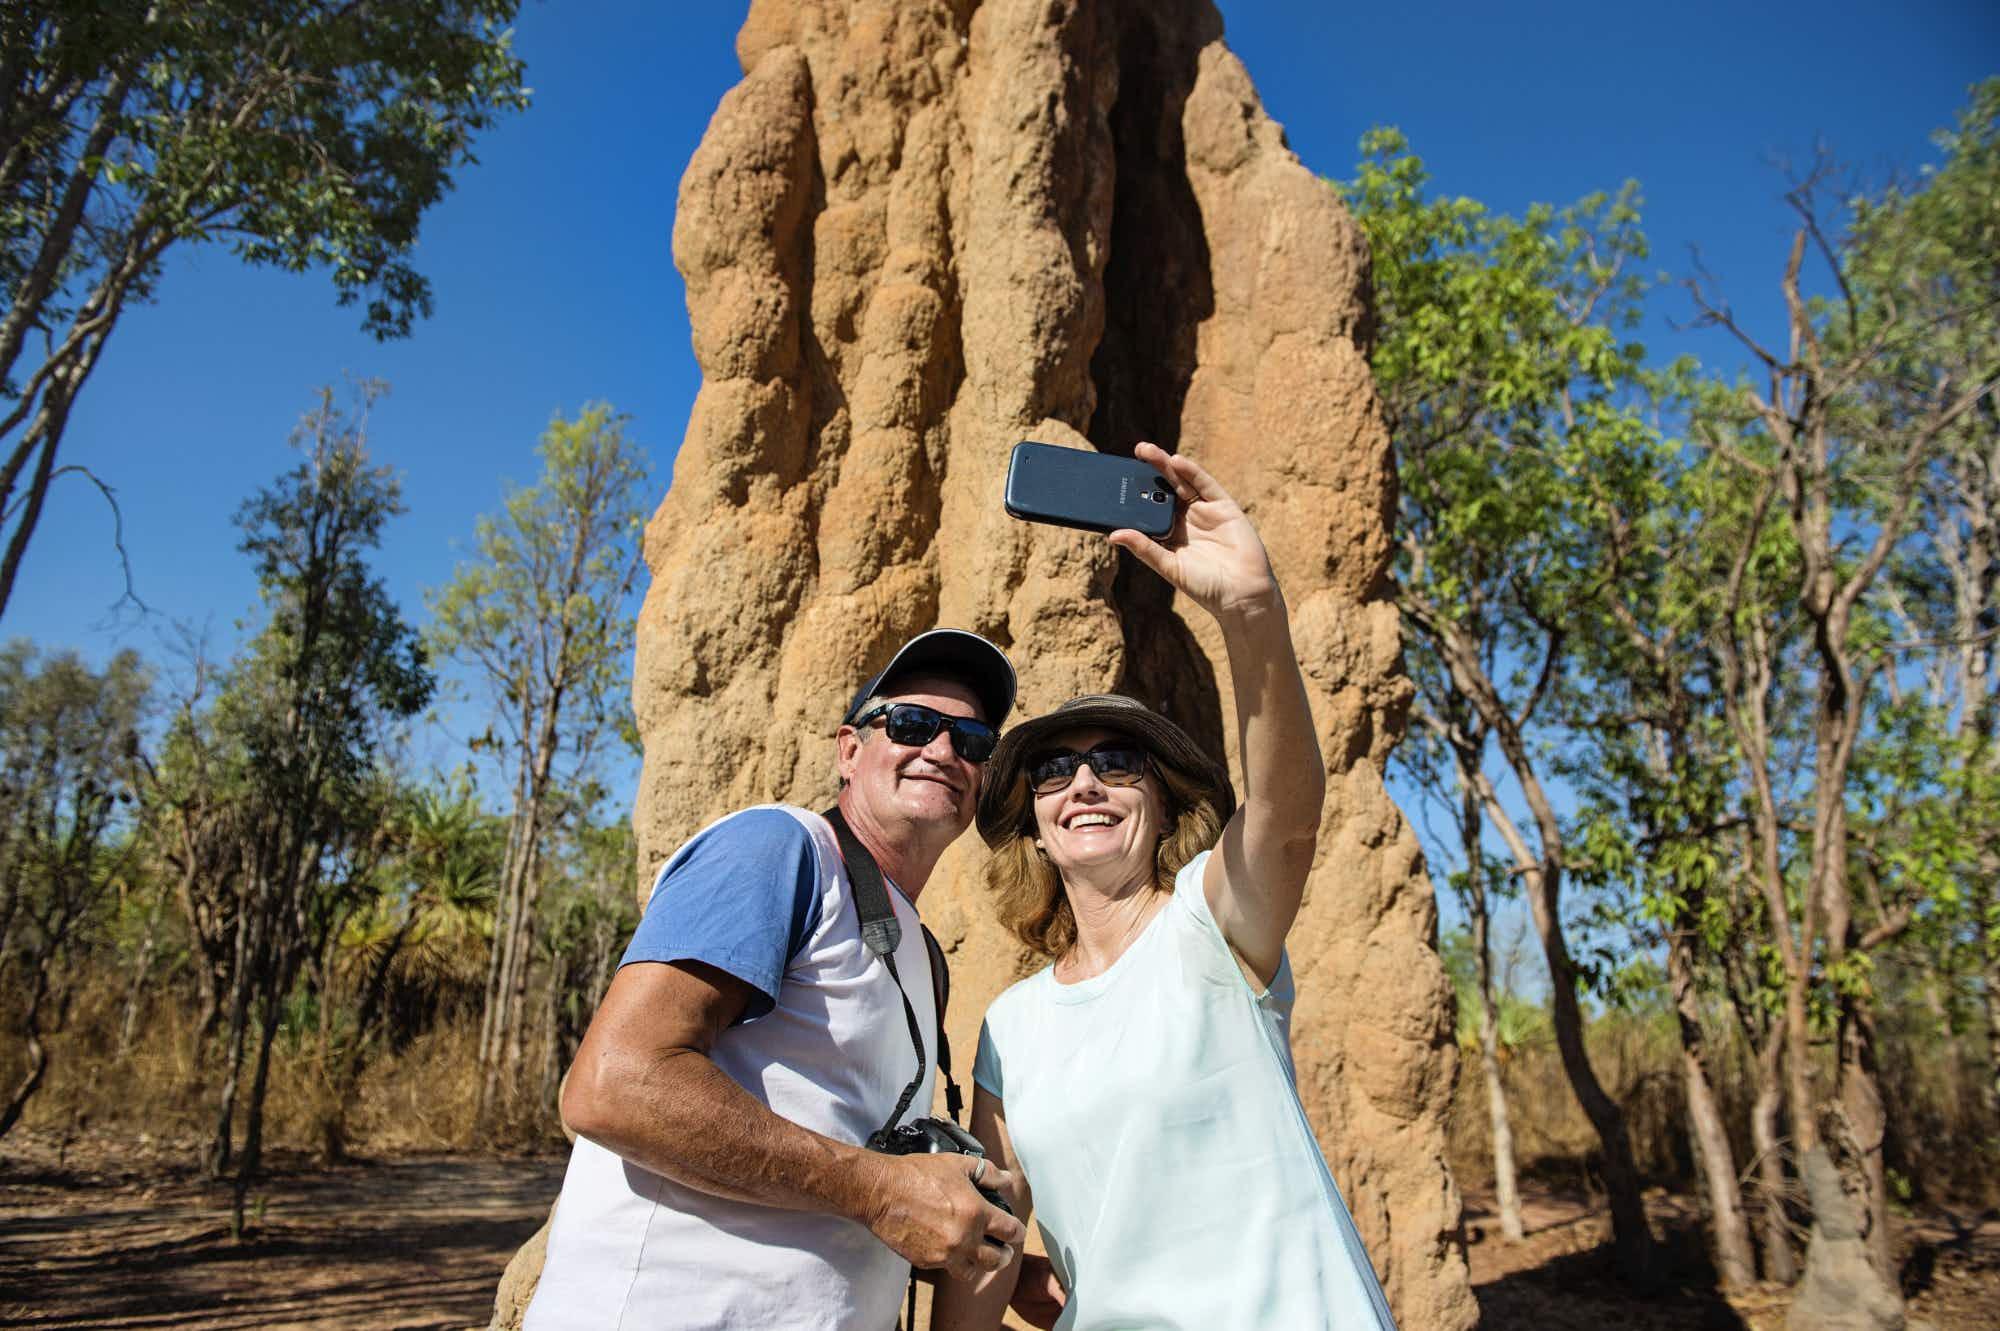 Australia's Litchfield National Park to get a makeover